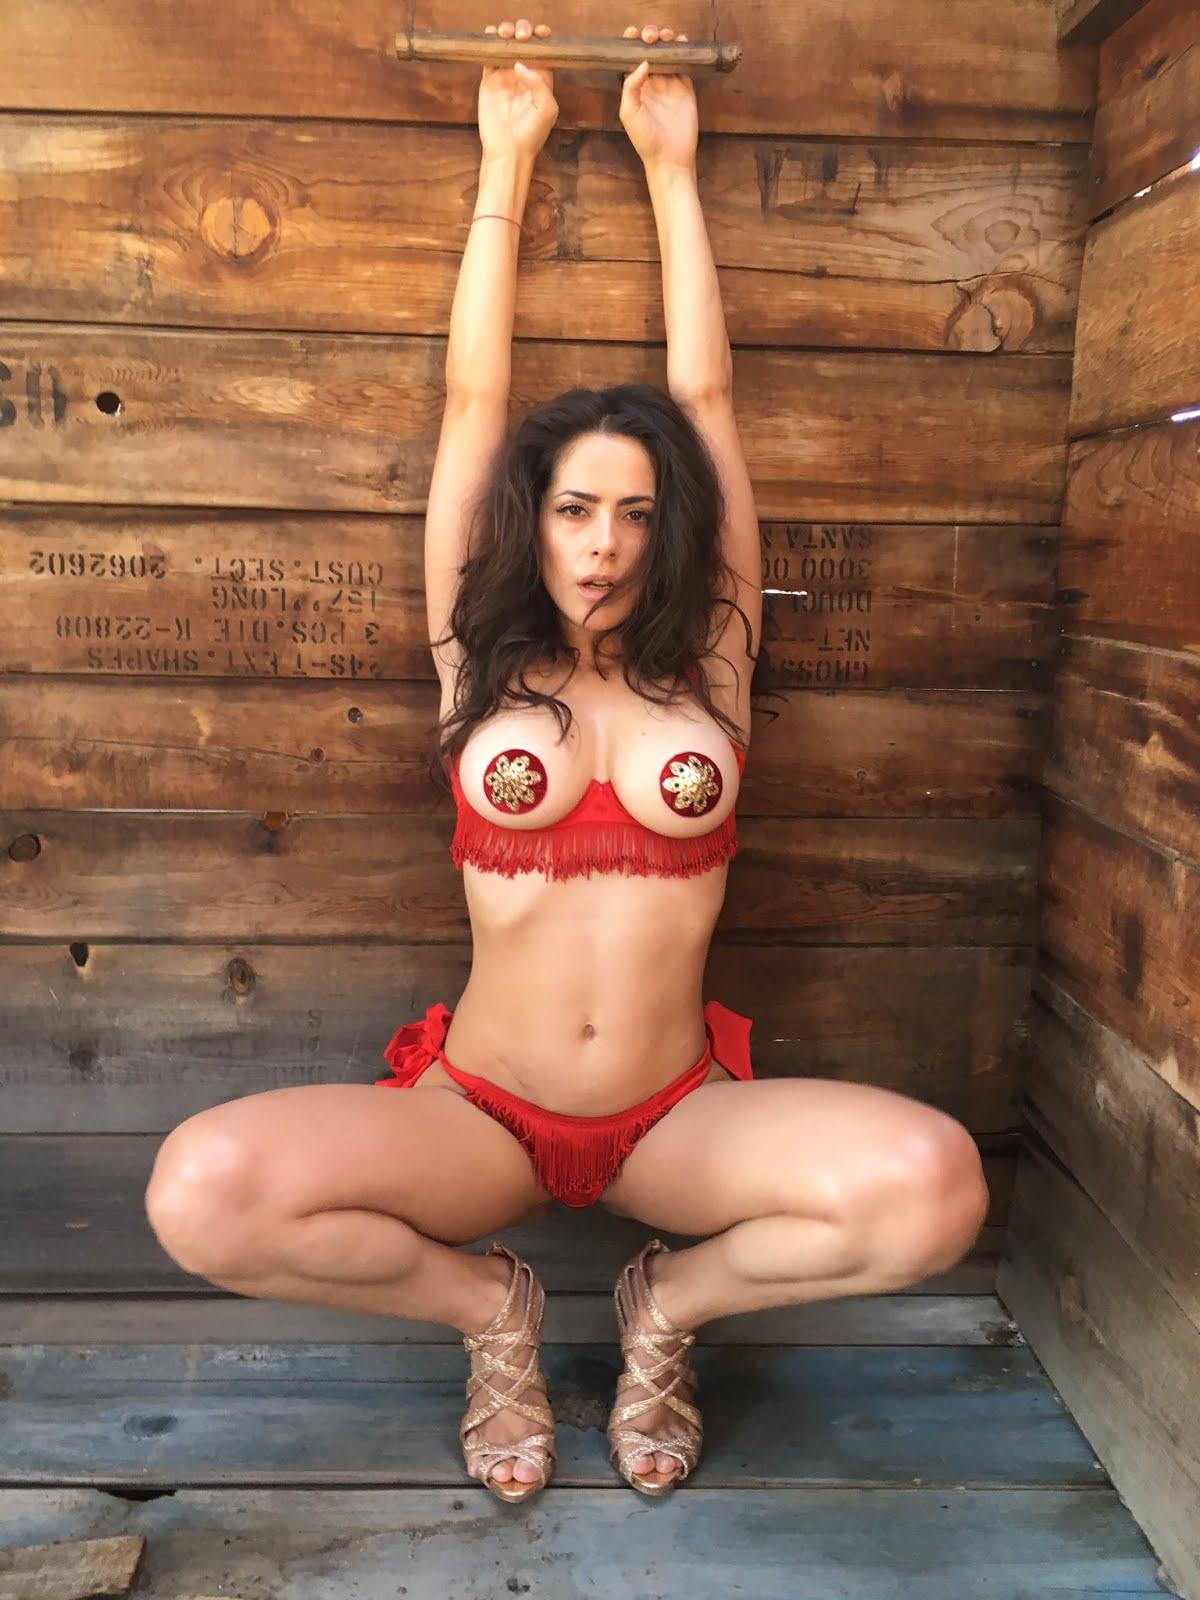 Victoria vannucci nude